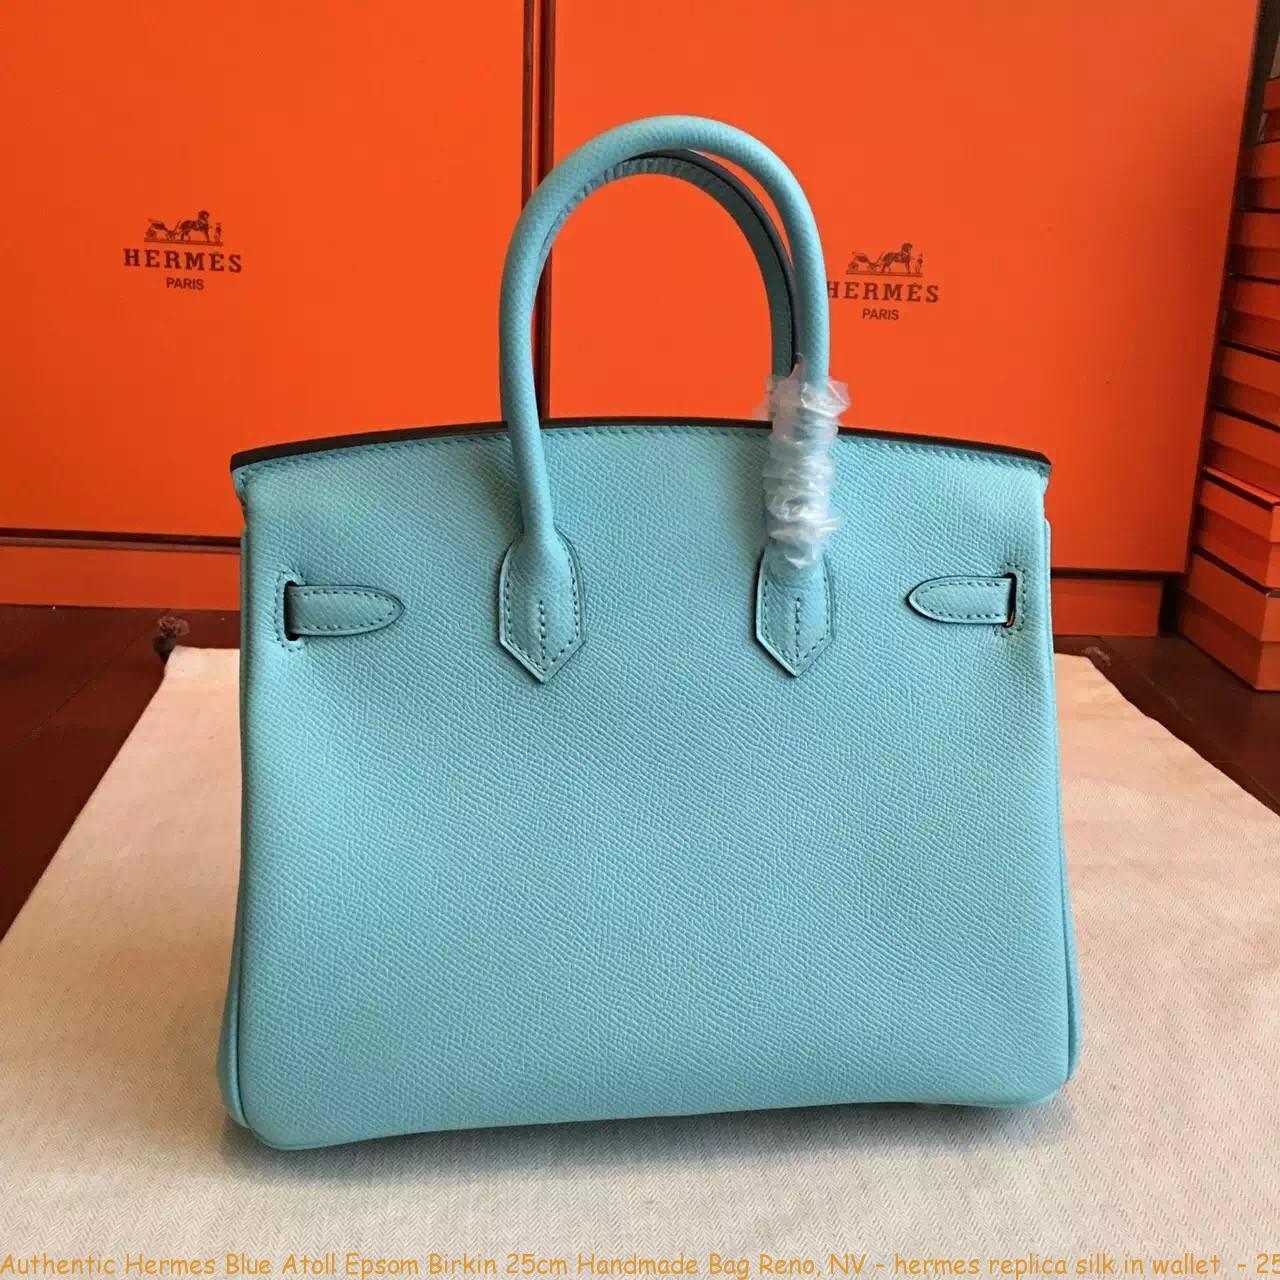 2691b5453660 Authentic Hermes Blue Atoll Epsom Birkin 25cm Handmade Bag Reno